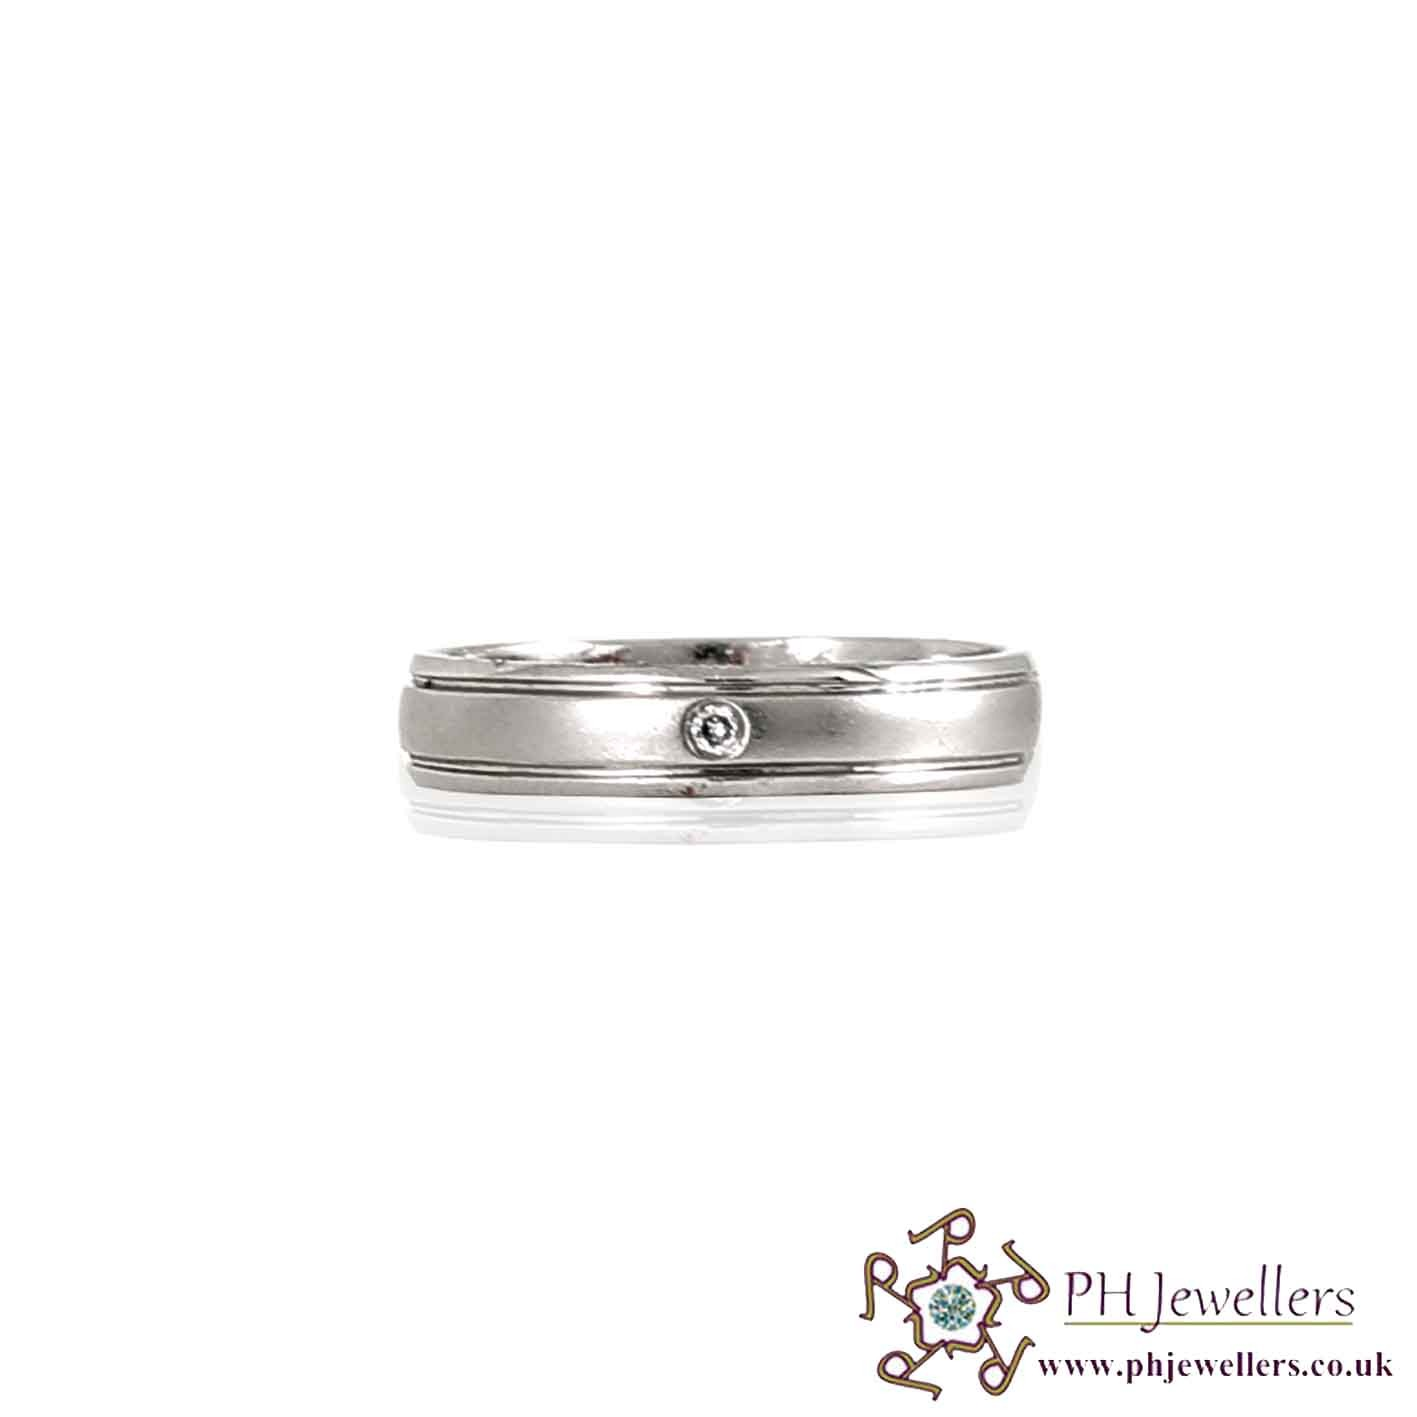 18CT 750 White Gold Wedding Band Diamond Size Q Ring DWB1